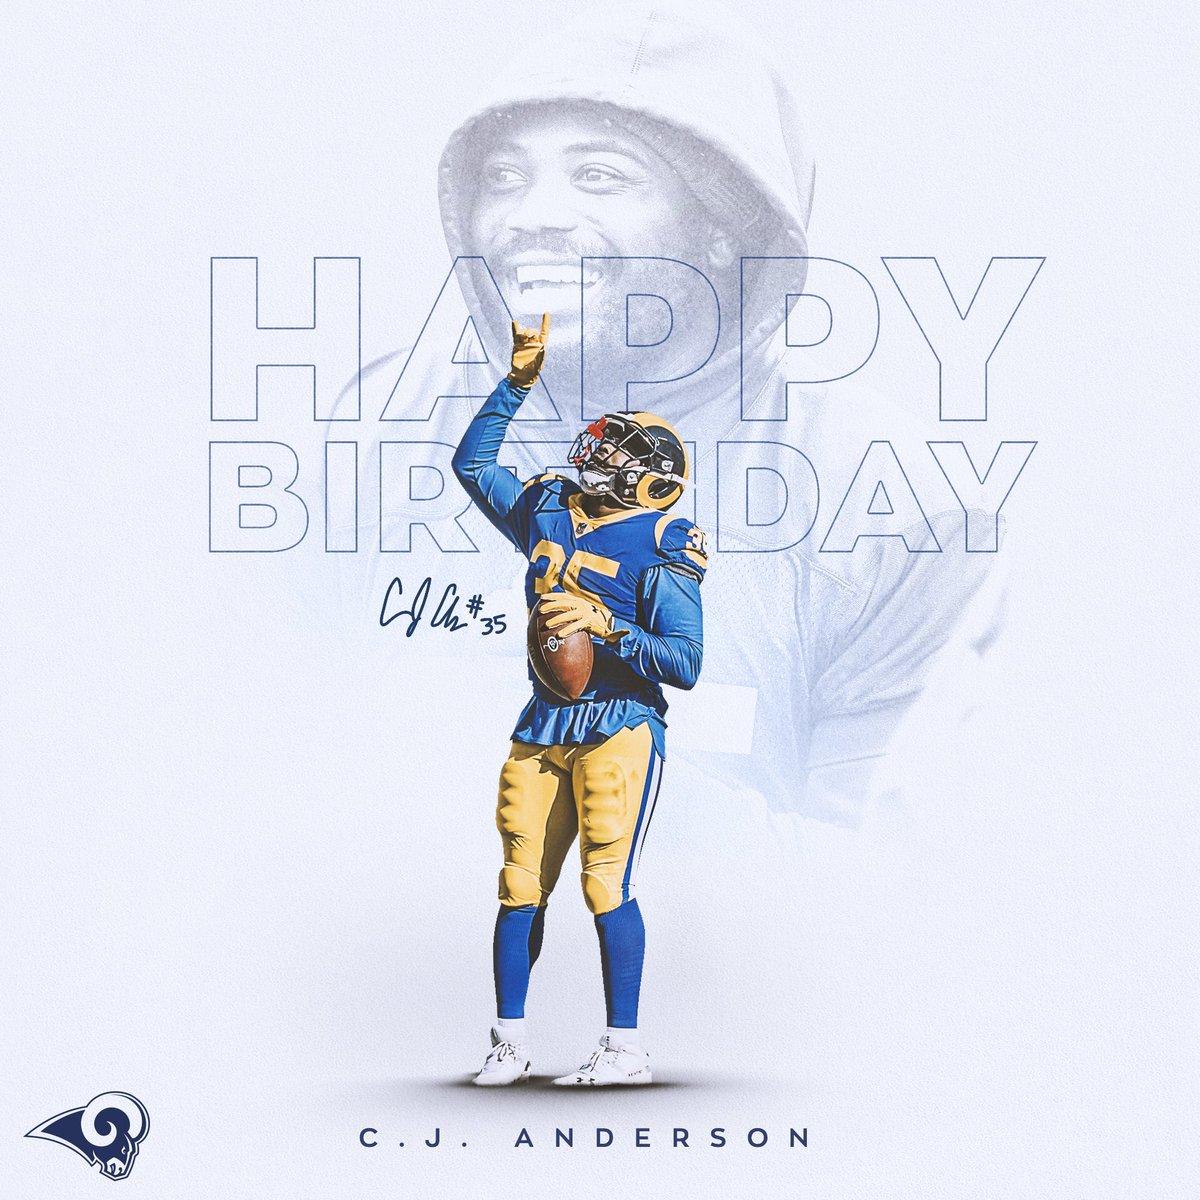 RT to wish @cjandersonb22 a happy birthday!! 🎉 https://t.co/MLhR6tx7Eh